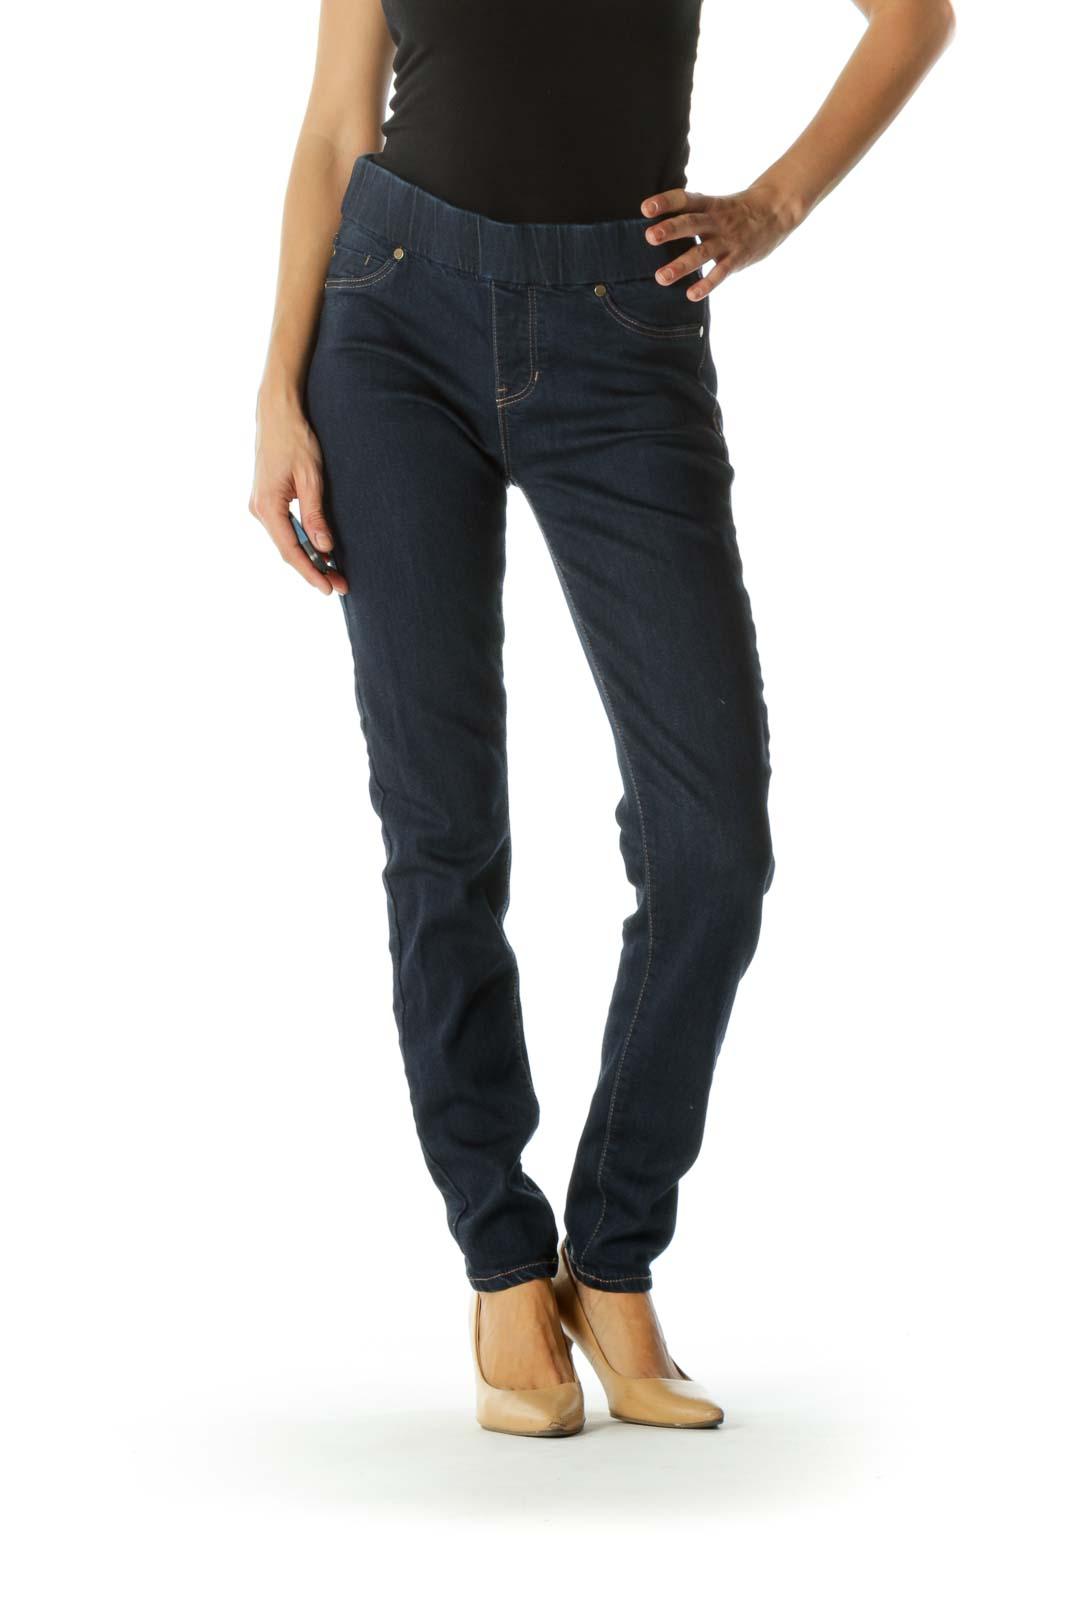 Blue Dark-Wash Elastic Waist-Band Faux-Front-Pockets Denim Legging Front